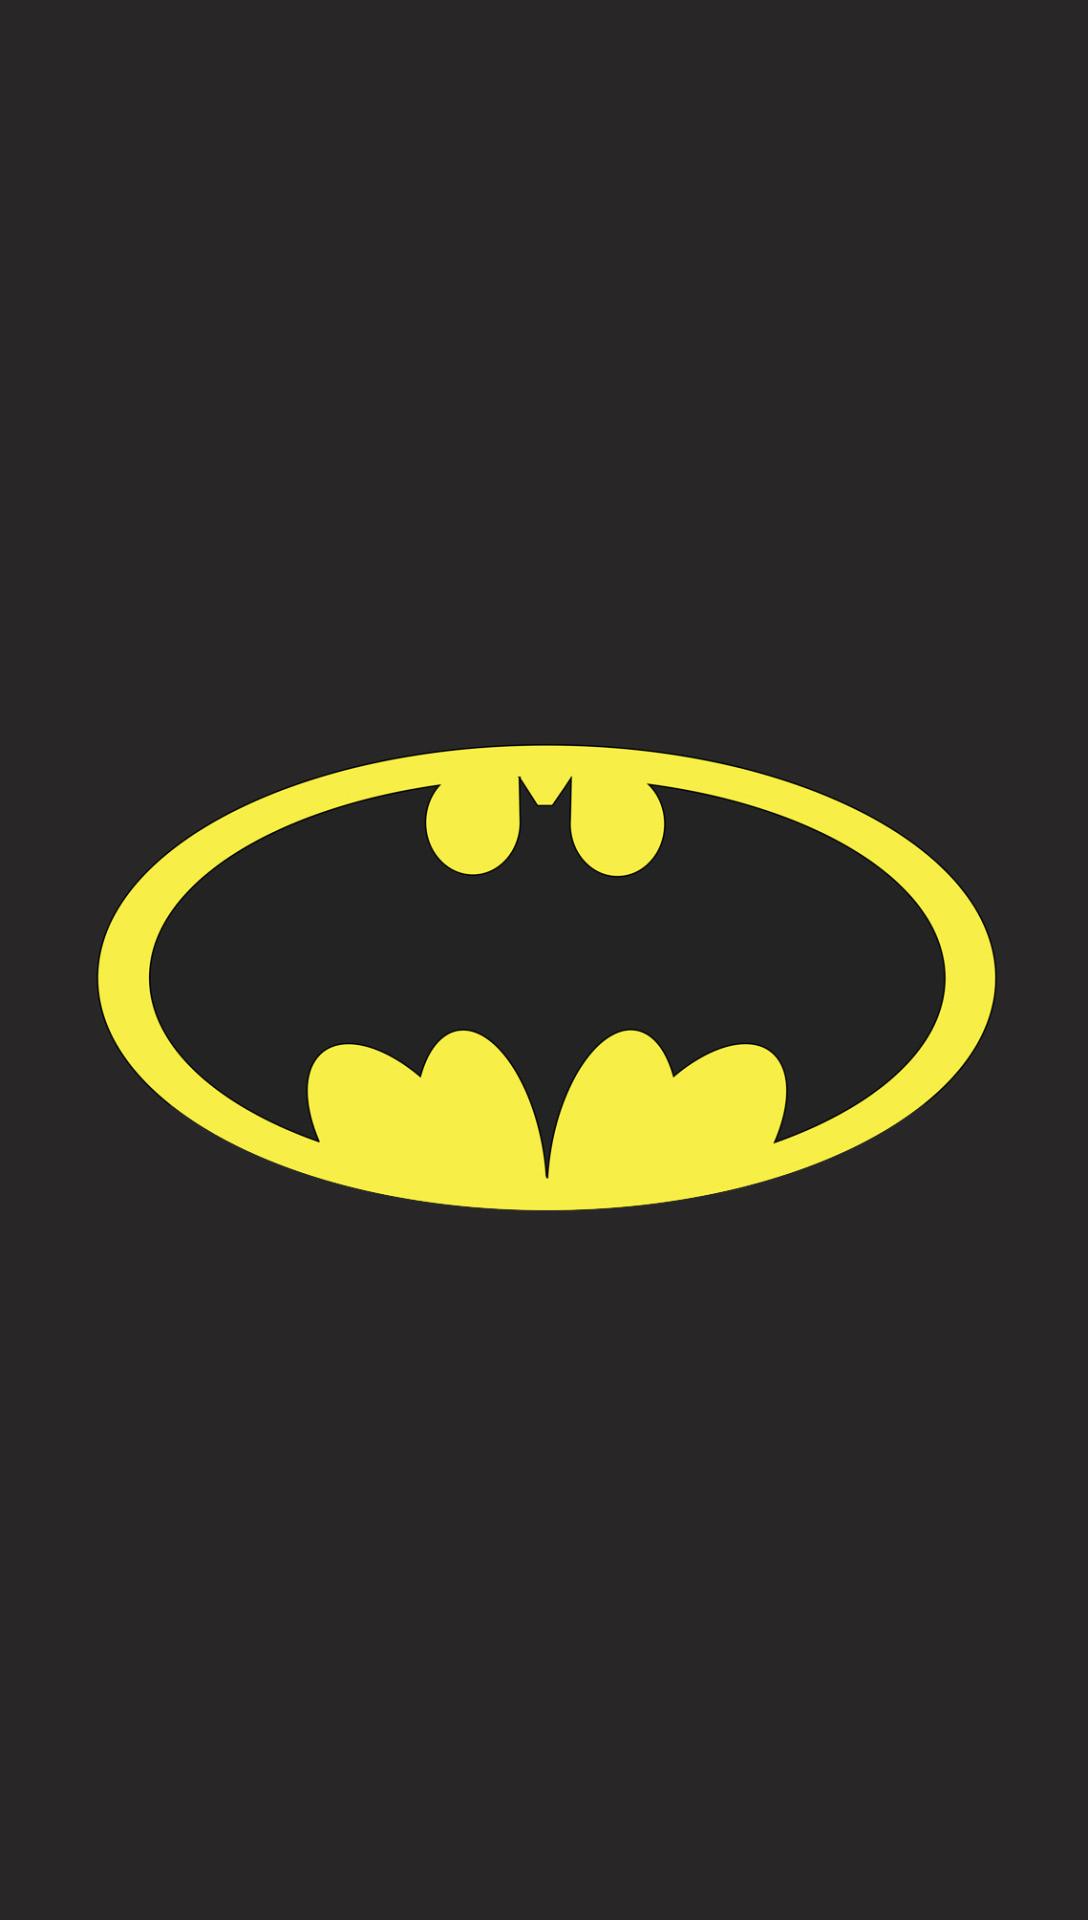 batman lockscreen | Tumblr